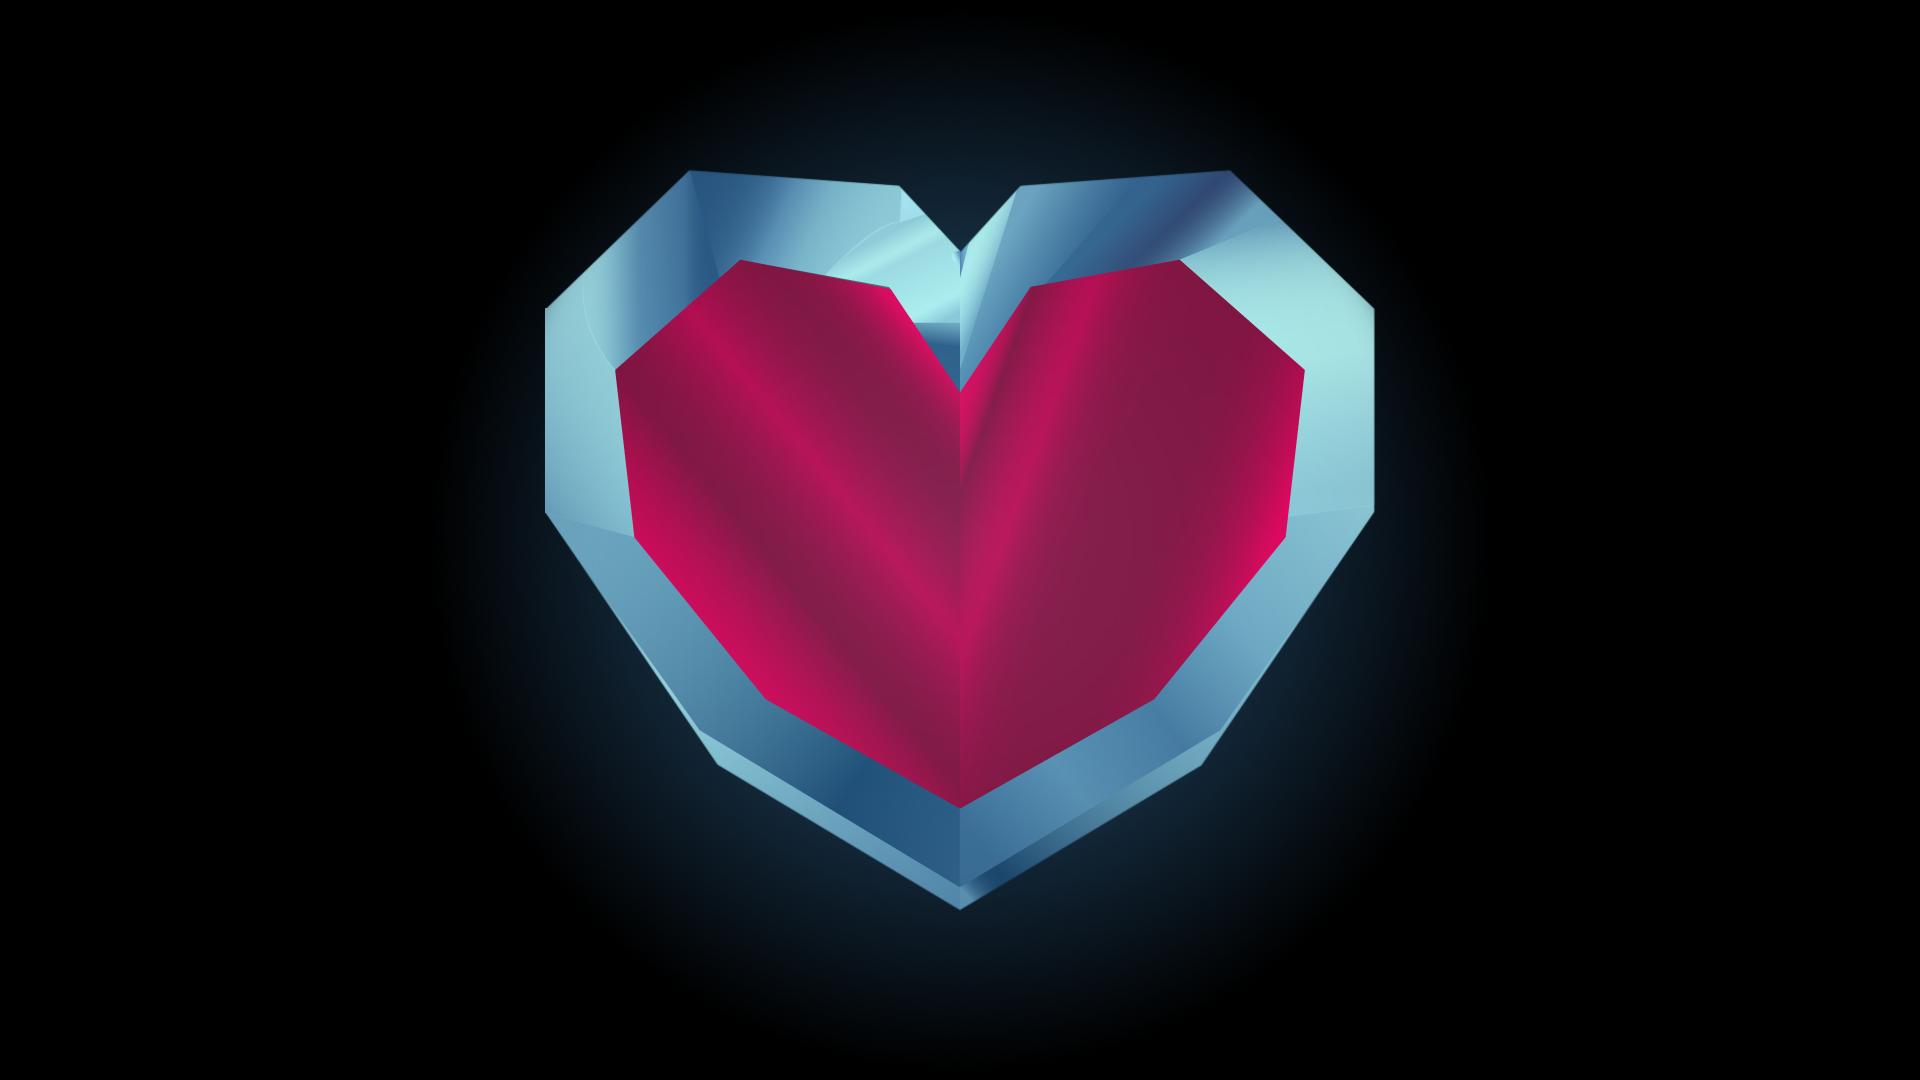 The Legend Of Zelda Heart Container Wallpaper Ocarina Of Time Heart Wallpaper